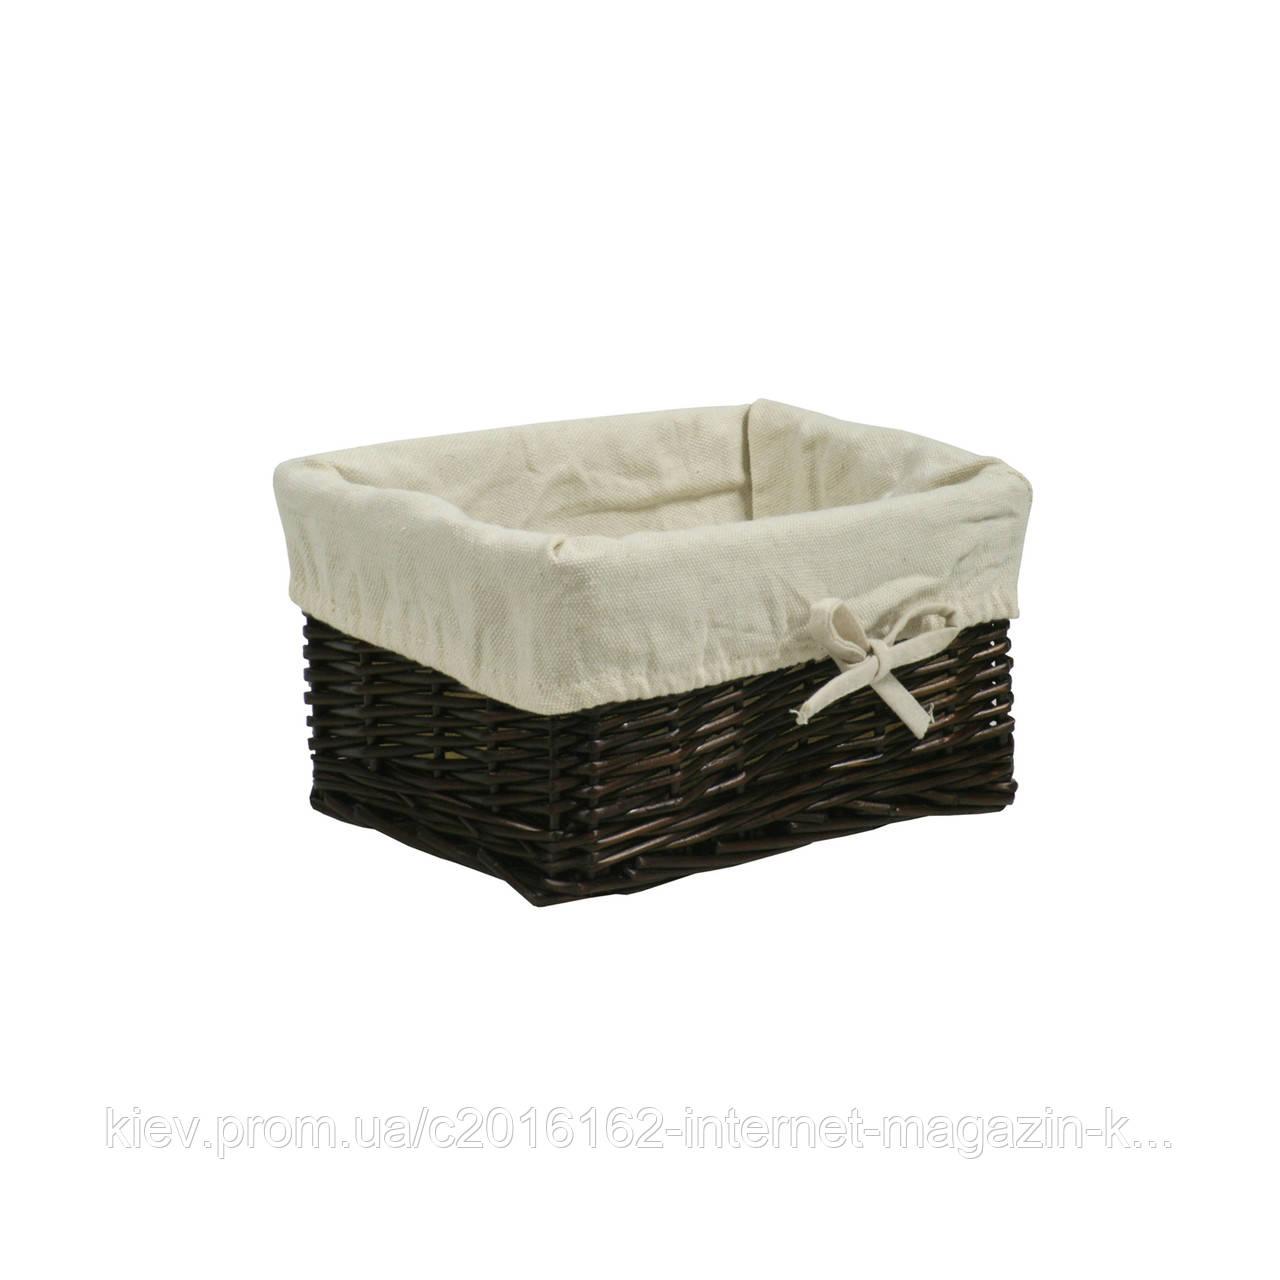 Корзинка из лозы для дома Home4You MAX-2  24x18xH12cm  weave  dark brown  fabric